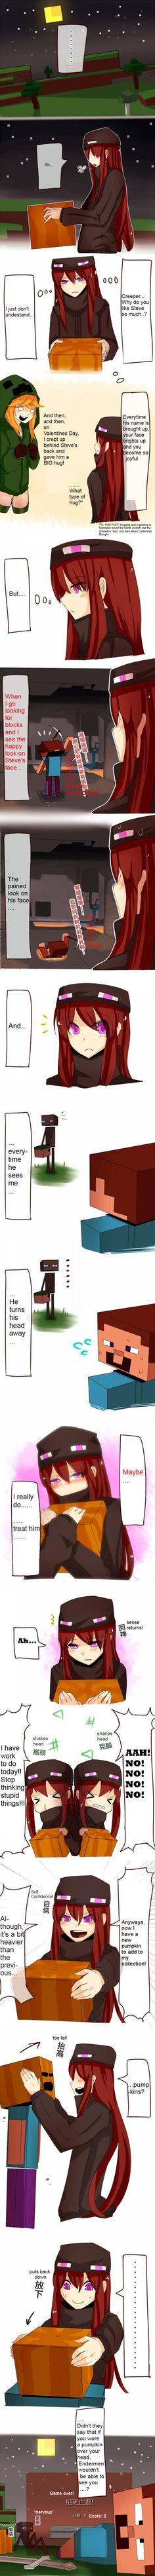 Minecraft manga EnderWoman comic (Translated). by Wisebrightboy on DeviantArt